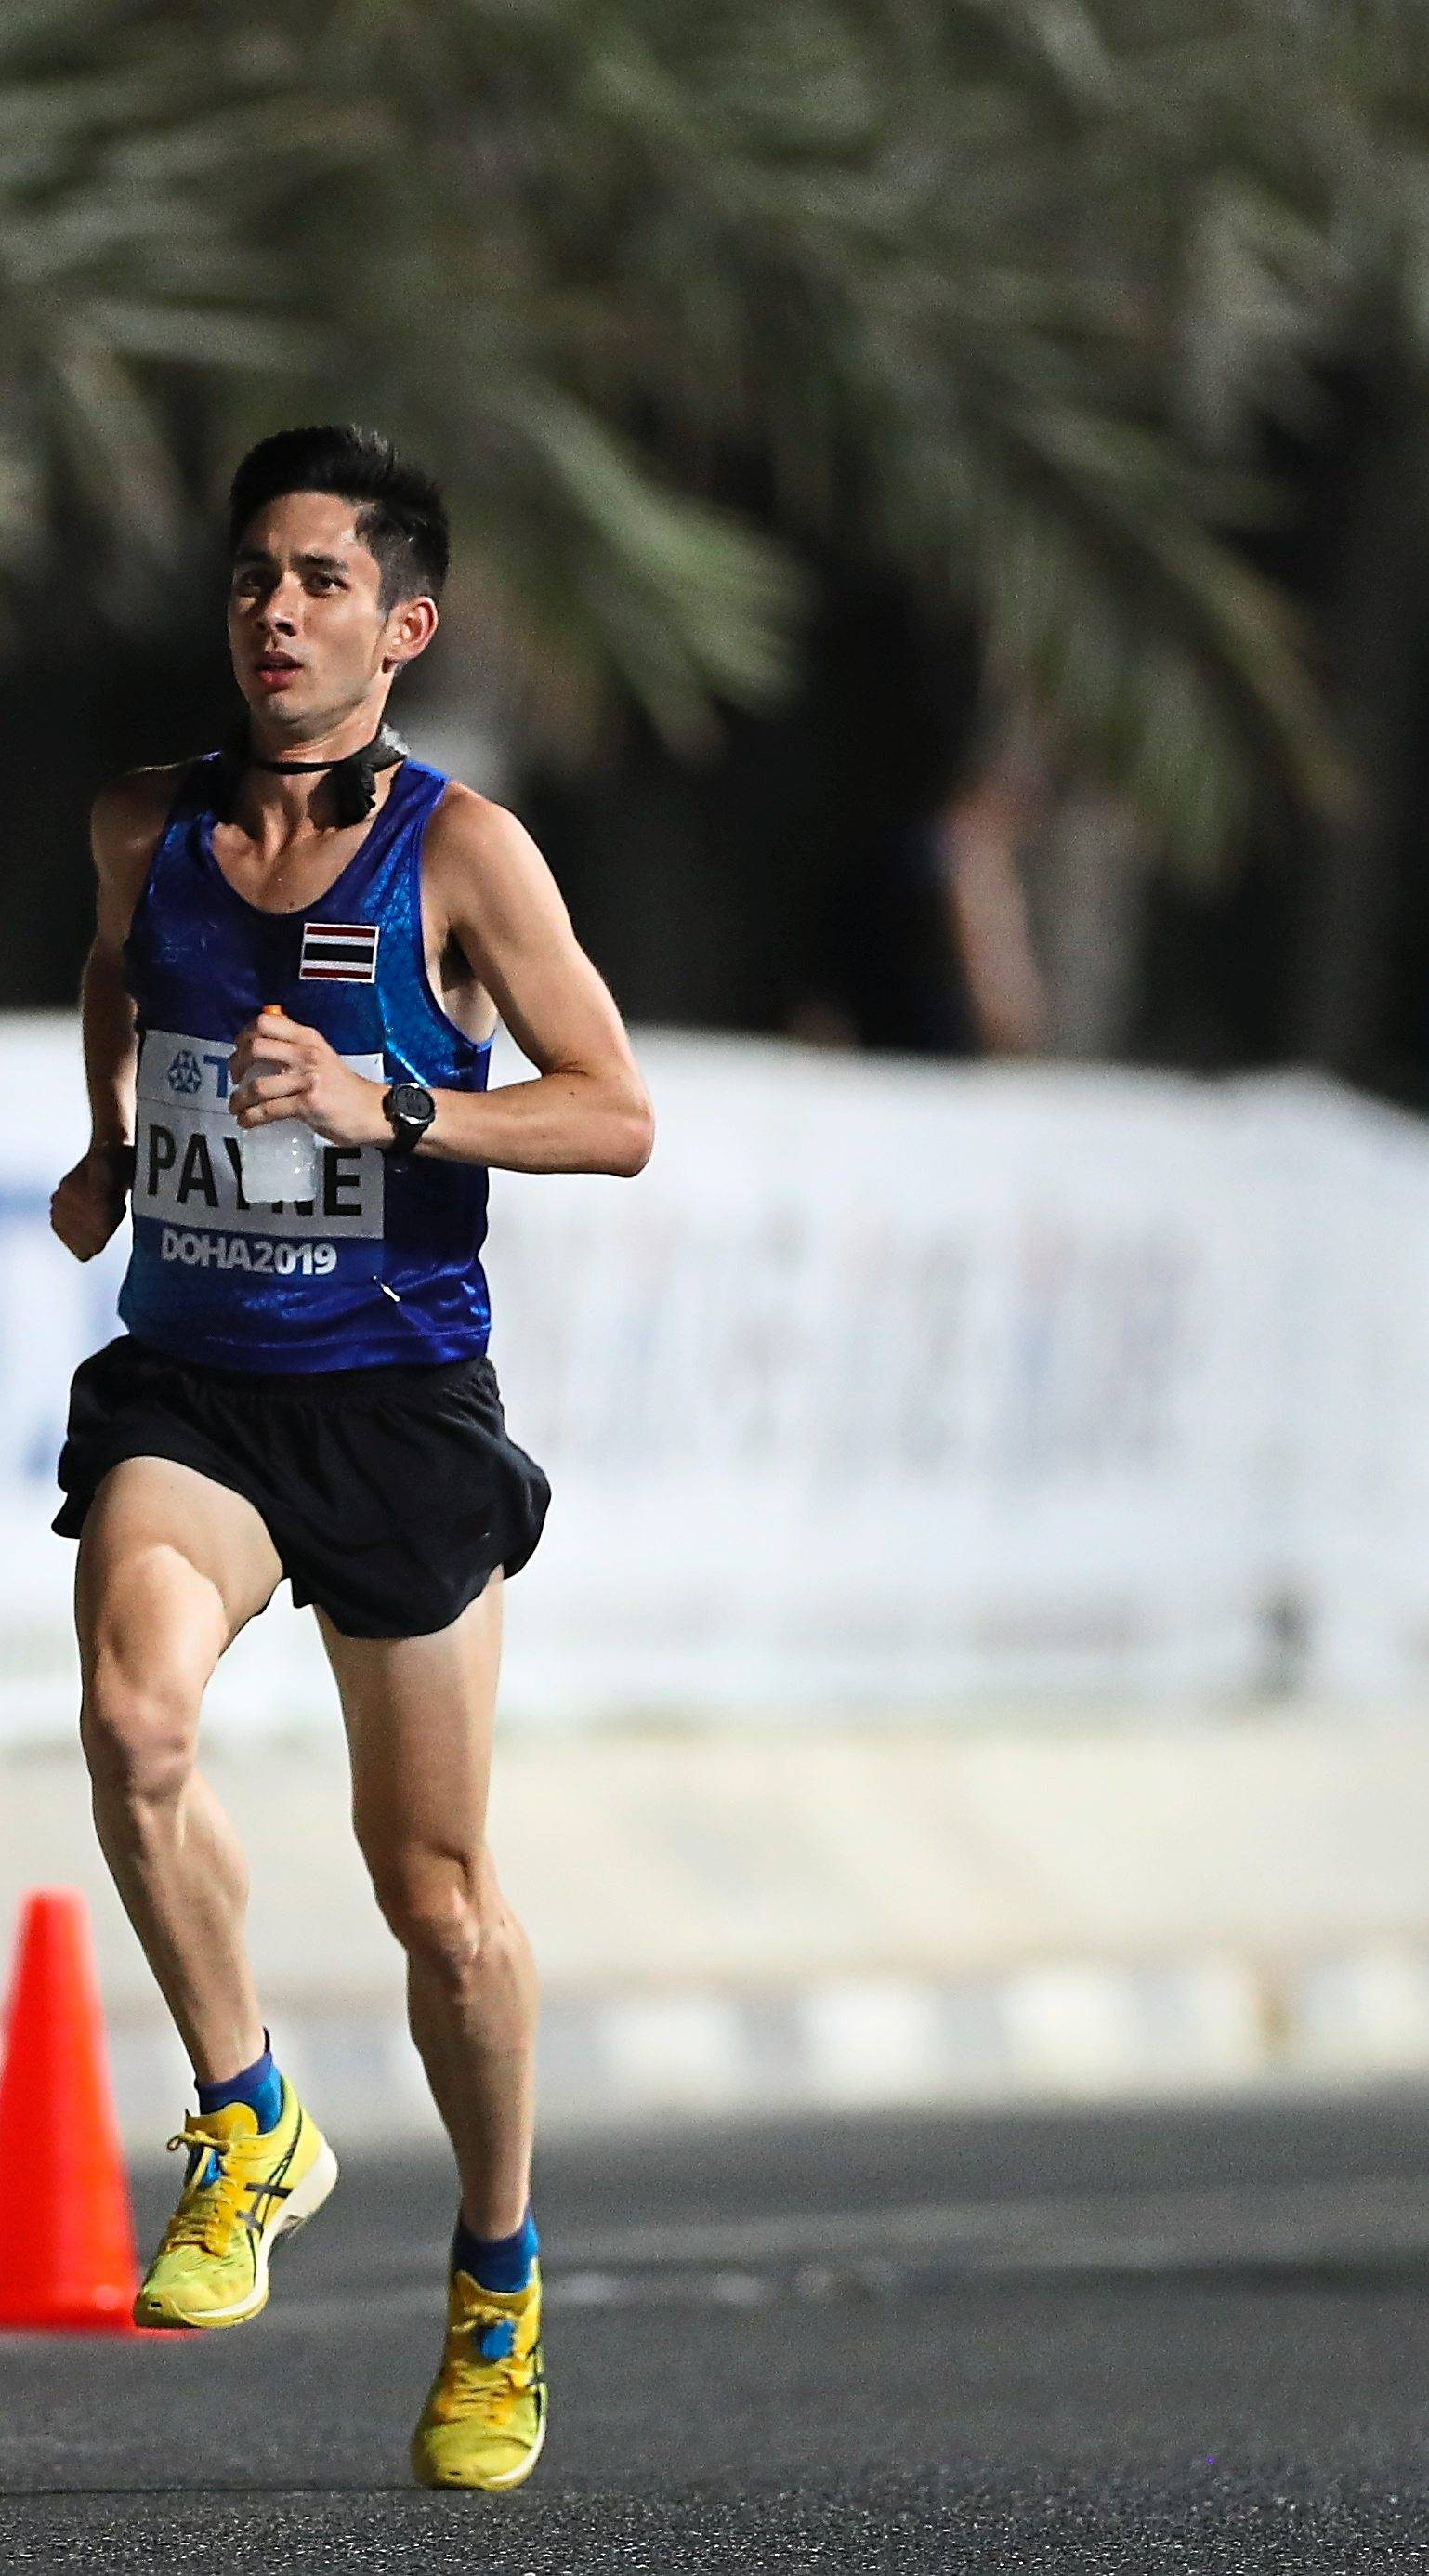 Kiwi turned Thai a pain for marathon runners